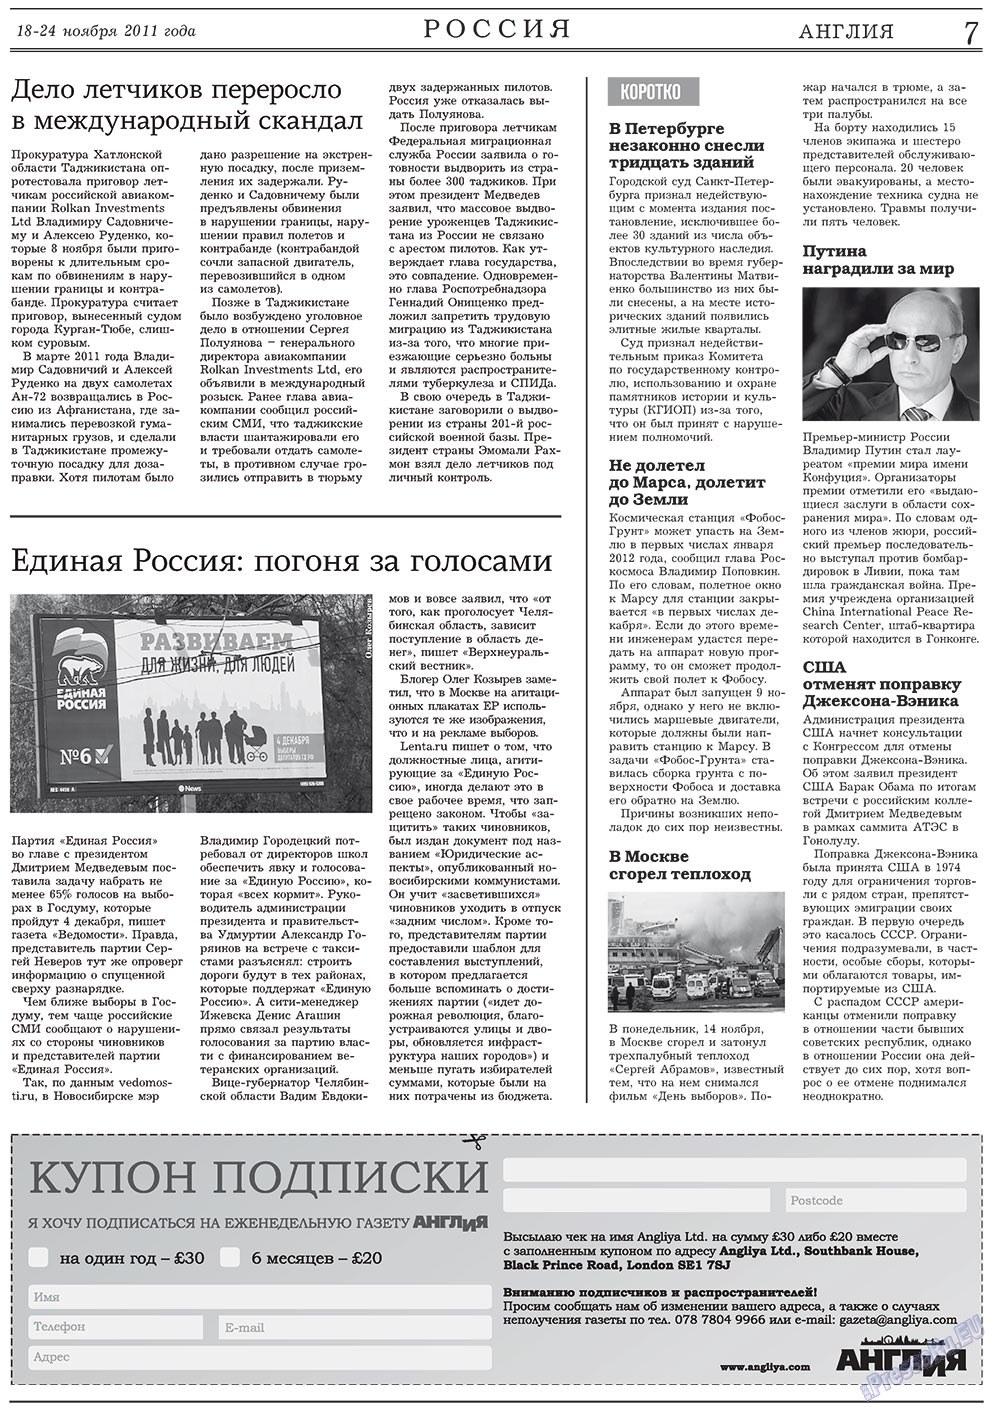 Англия (газета). 2011 год, номер 42, стр. 7